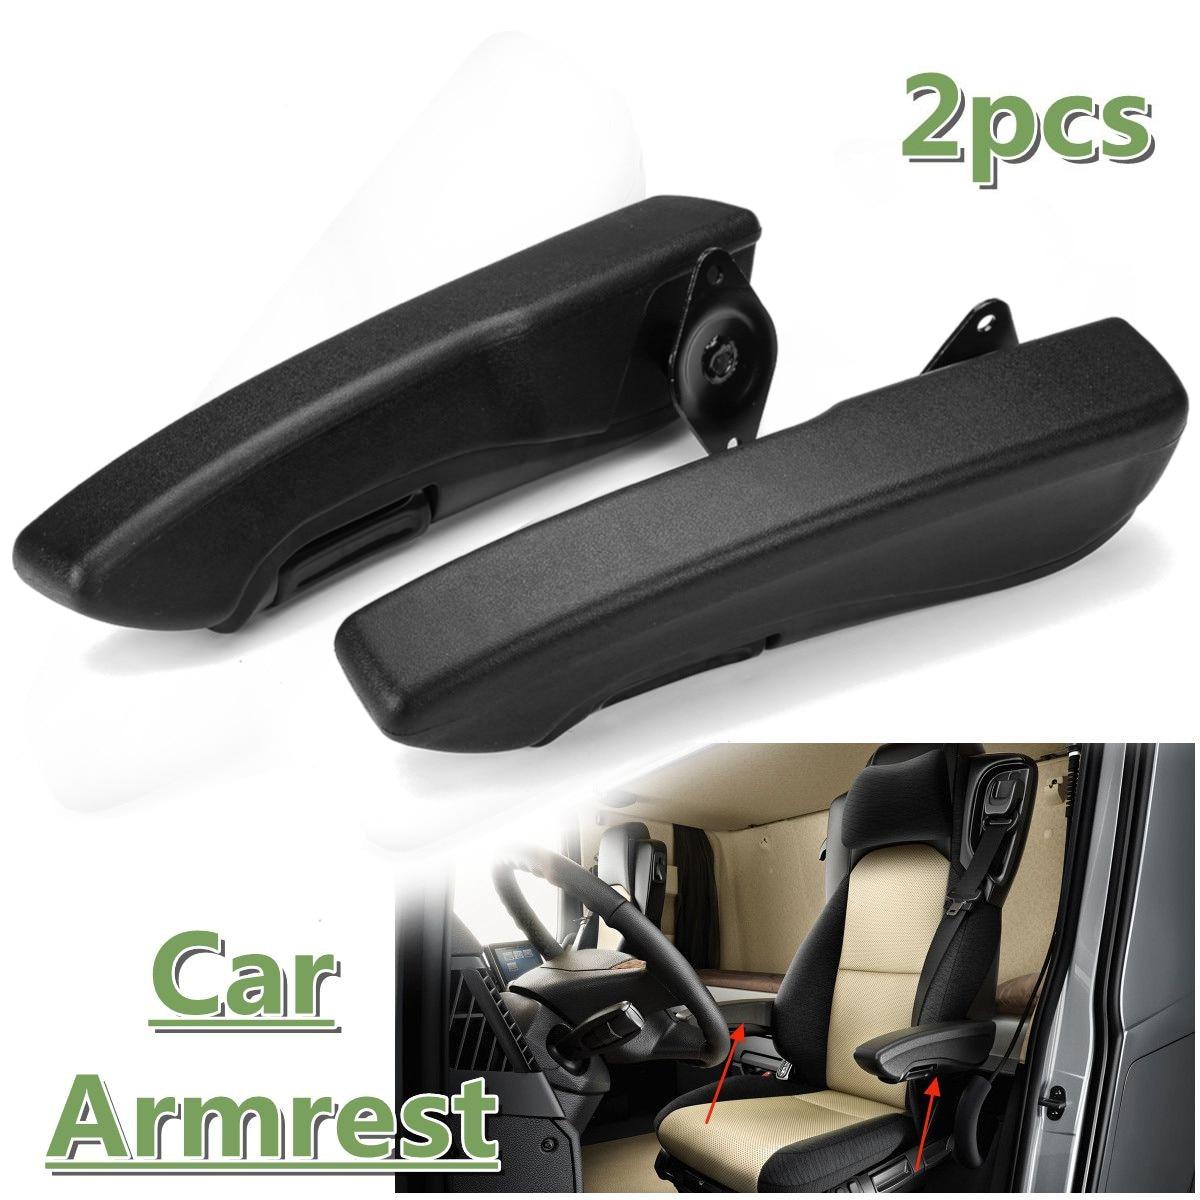 цена 2pcs Universal Car Adjustable Armrests Arm Seat Handle Engineering Seat Hand Rail Pair Comfortable Rest PU Foam Black for Truck